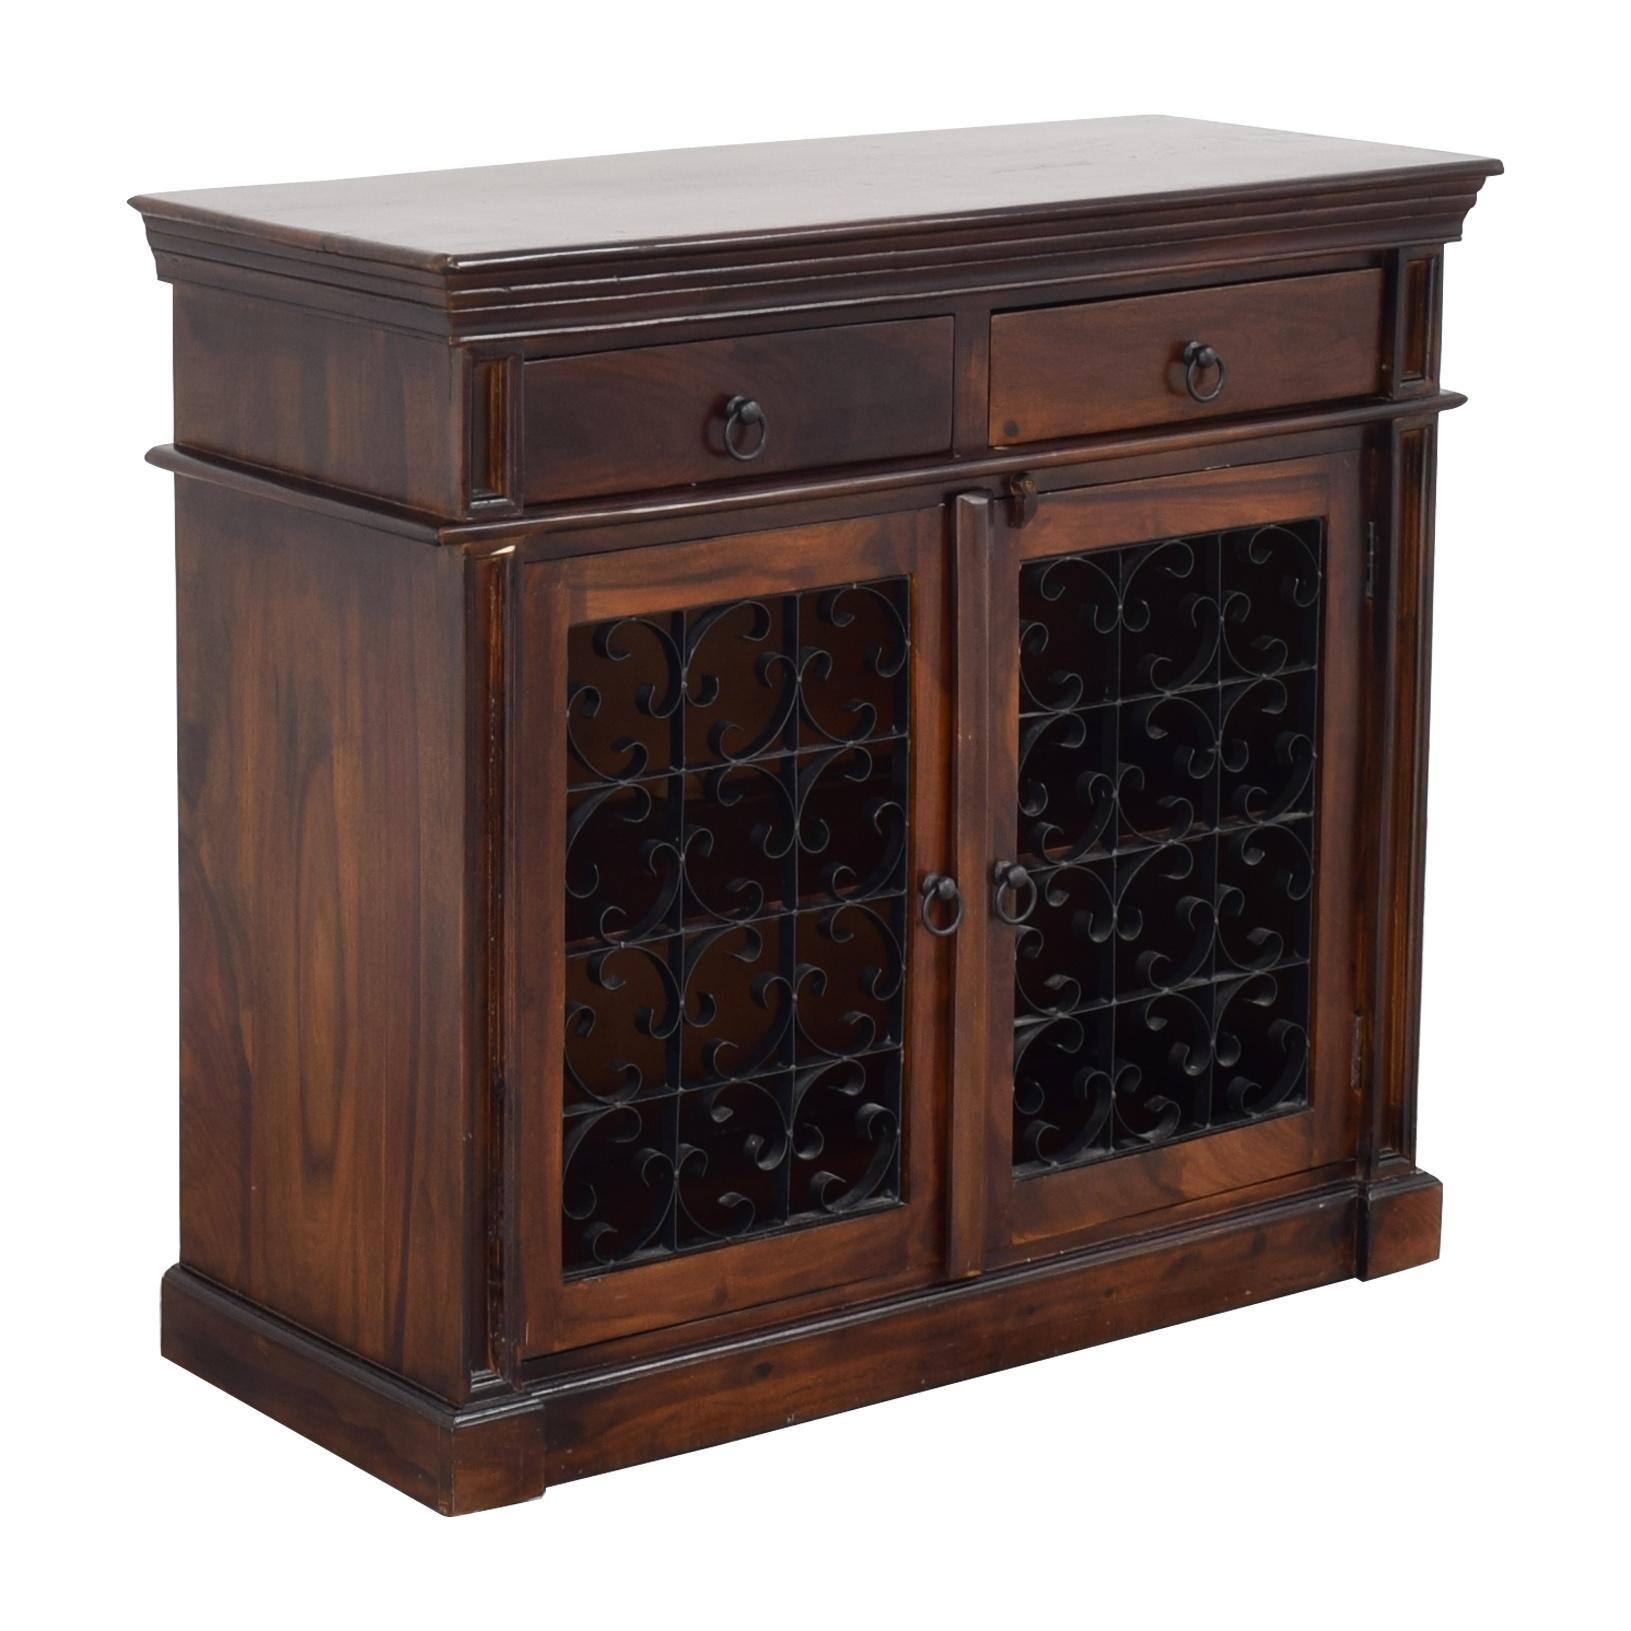 Pier 1 Bar Cabinet sale